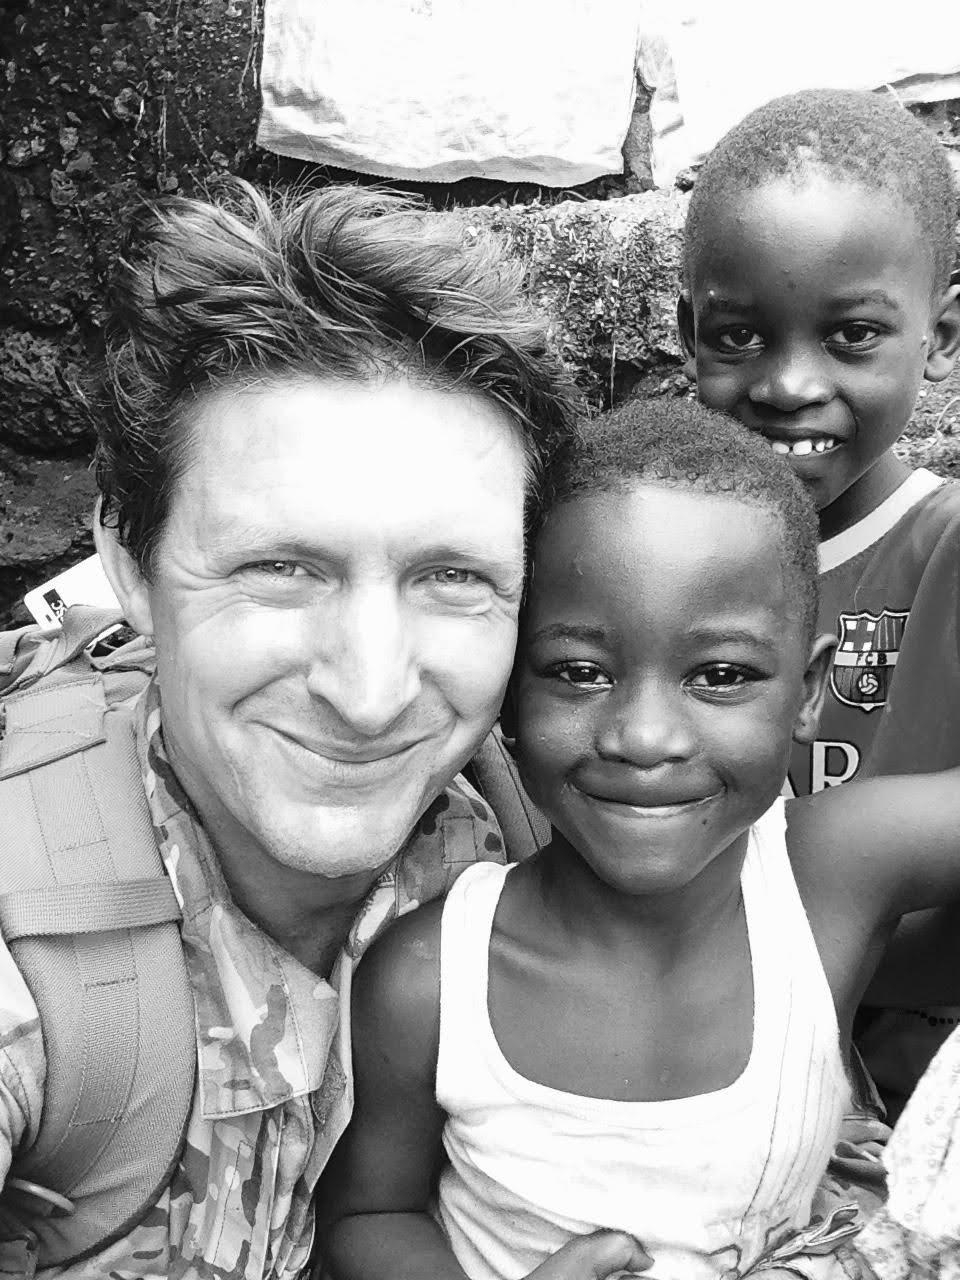 Maj Gen (Retd) Charlie Herbert with children in Sierra Leone